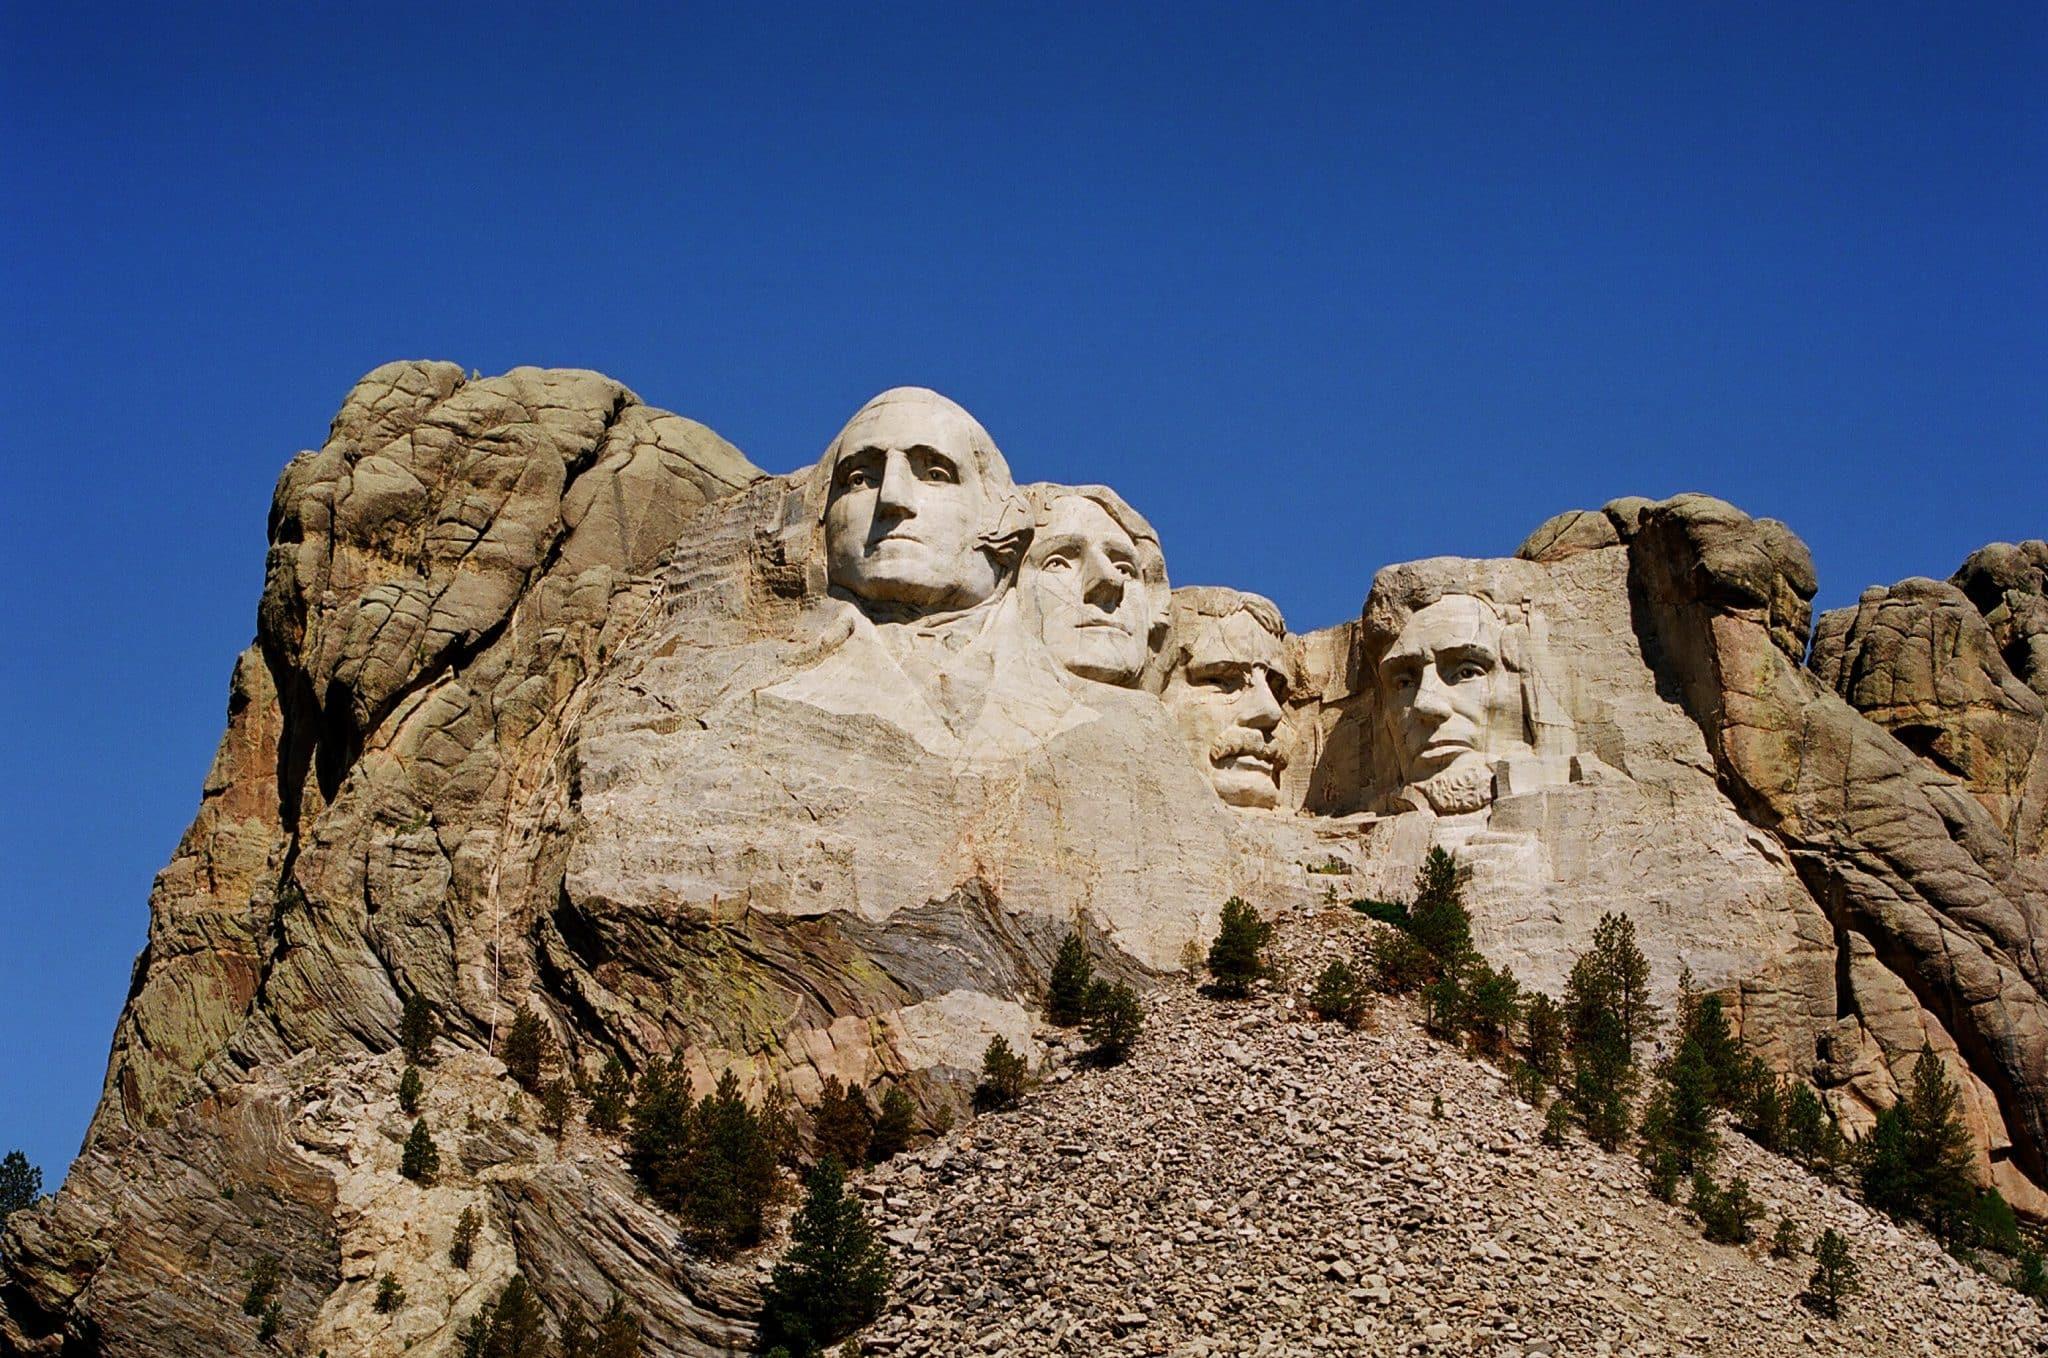 South Dakota: Mount Rushmore / Black Hills